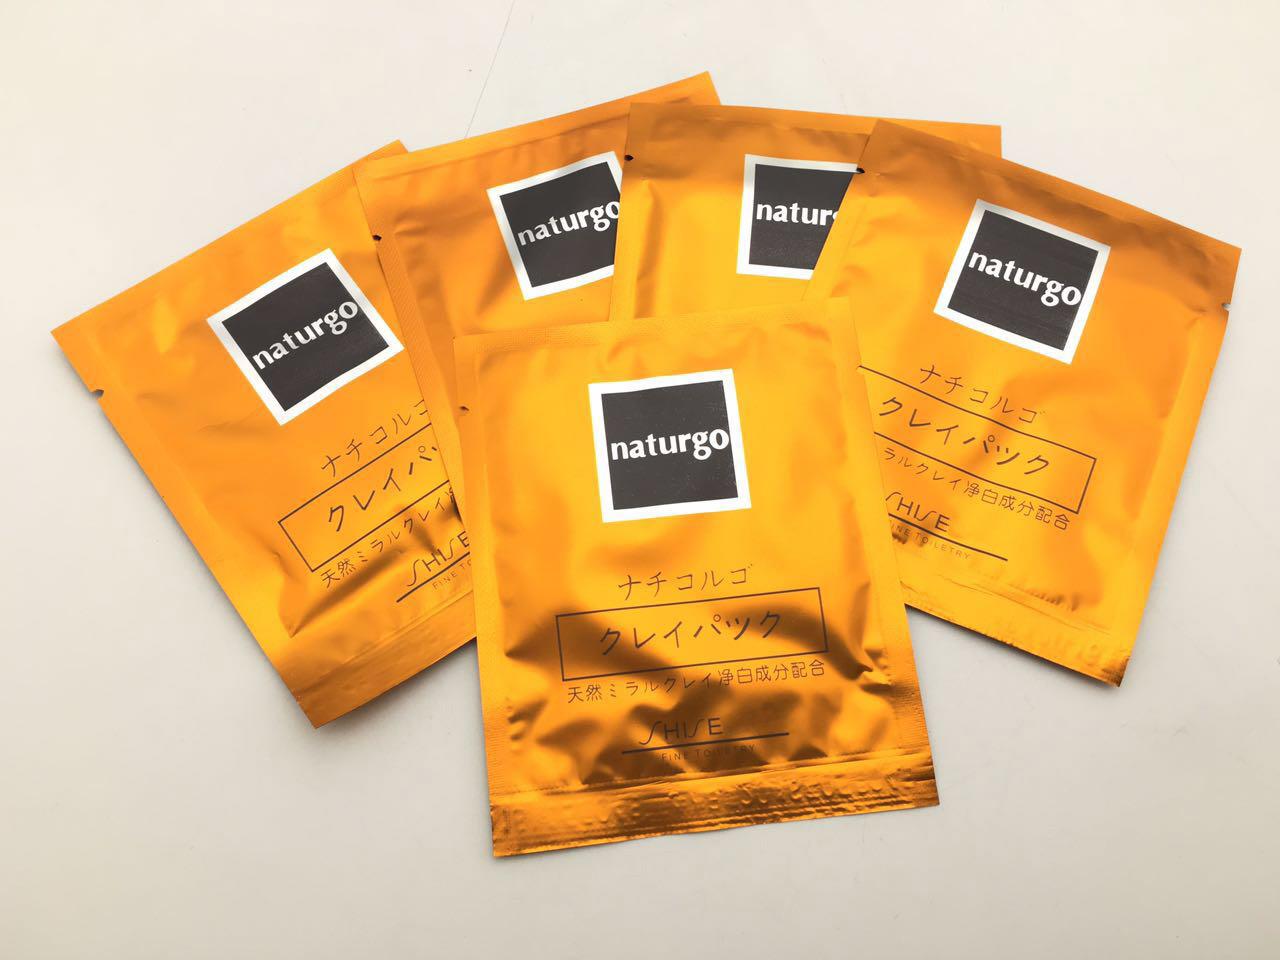 Jual Sachet Masker Naturgo Bpom Original By Shiseido Luxurious Hanasui Lumpur Per Box